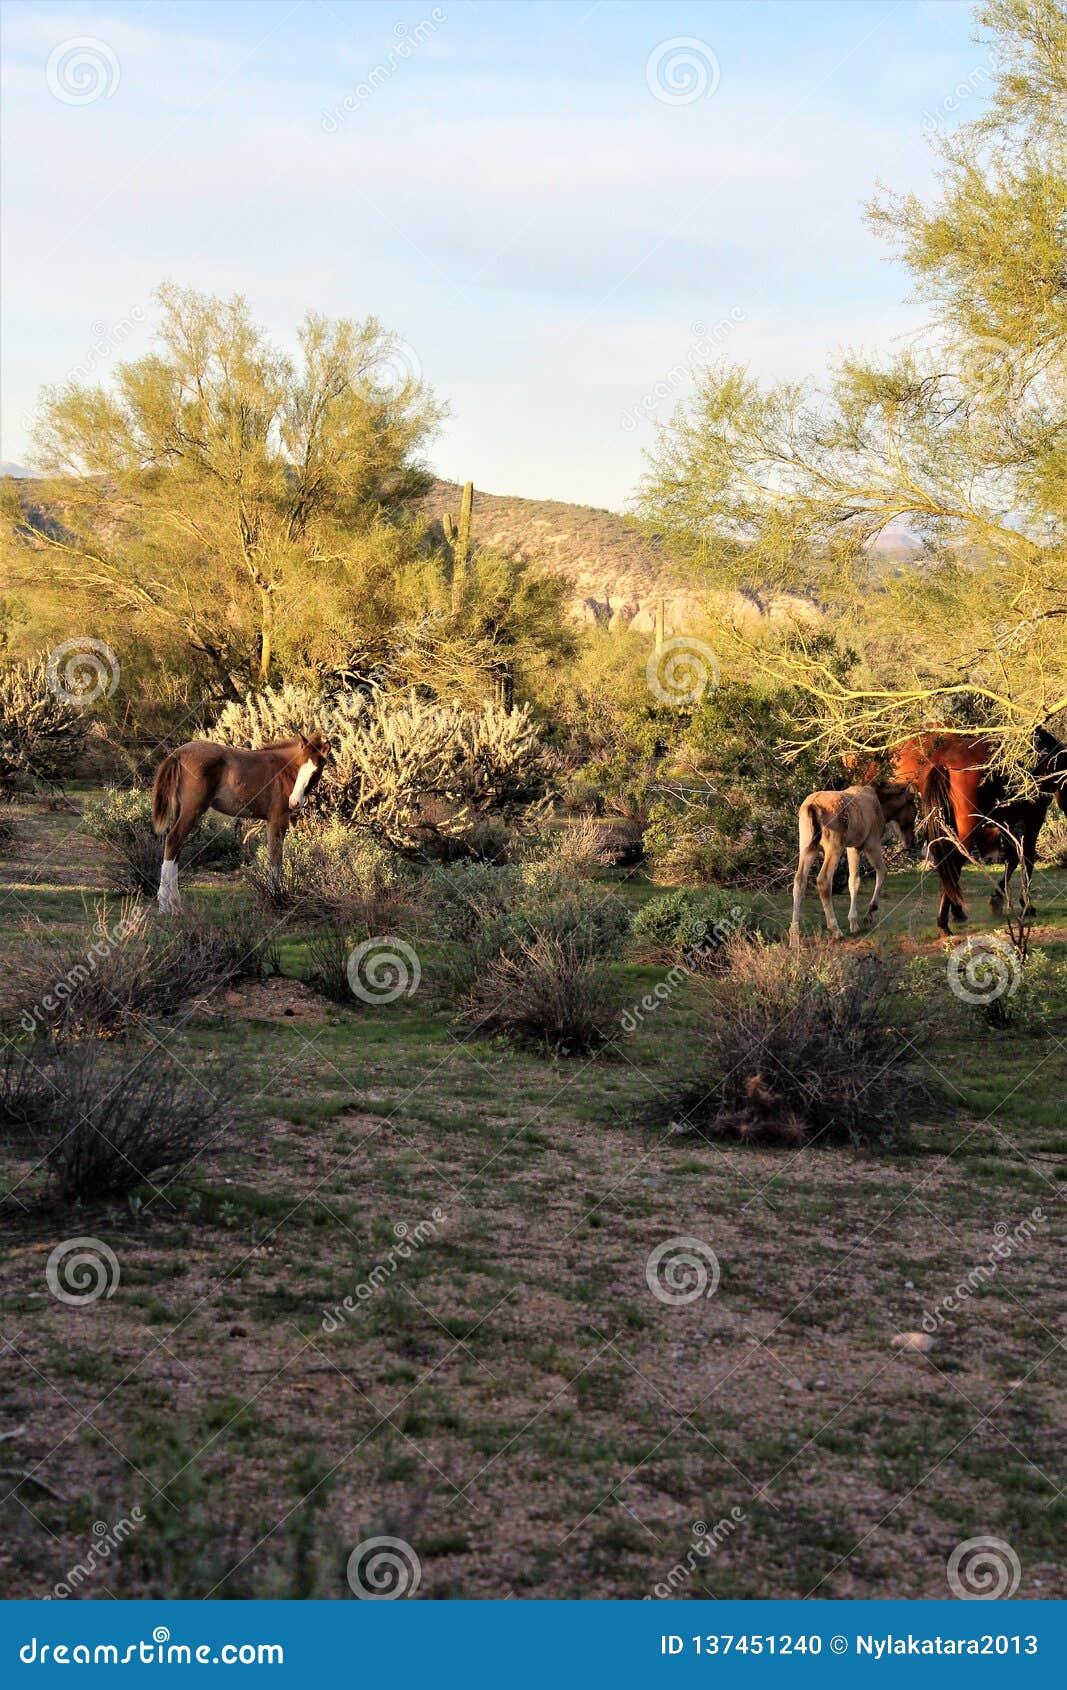 Salt River wild horses, in Tonto National Forest, Arizona, United States